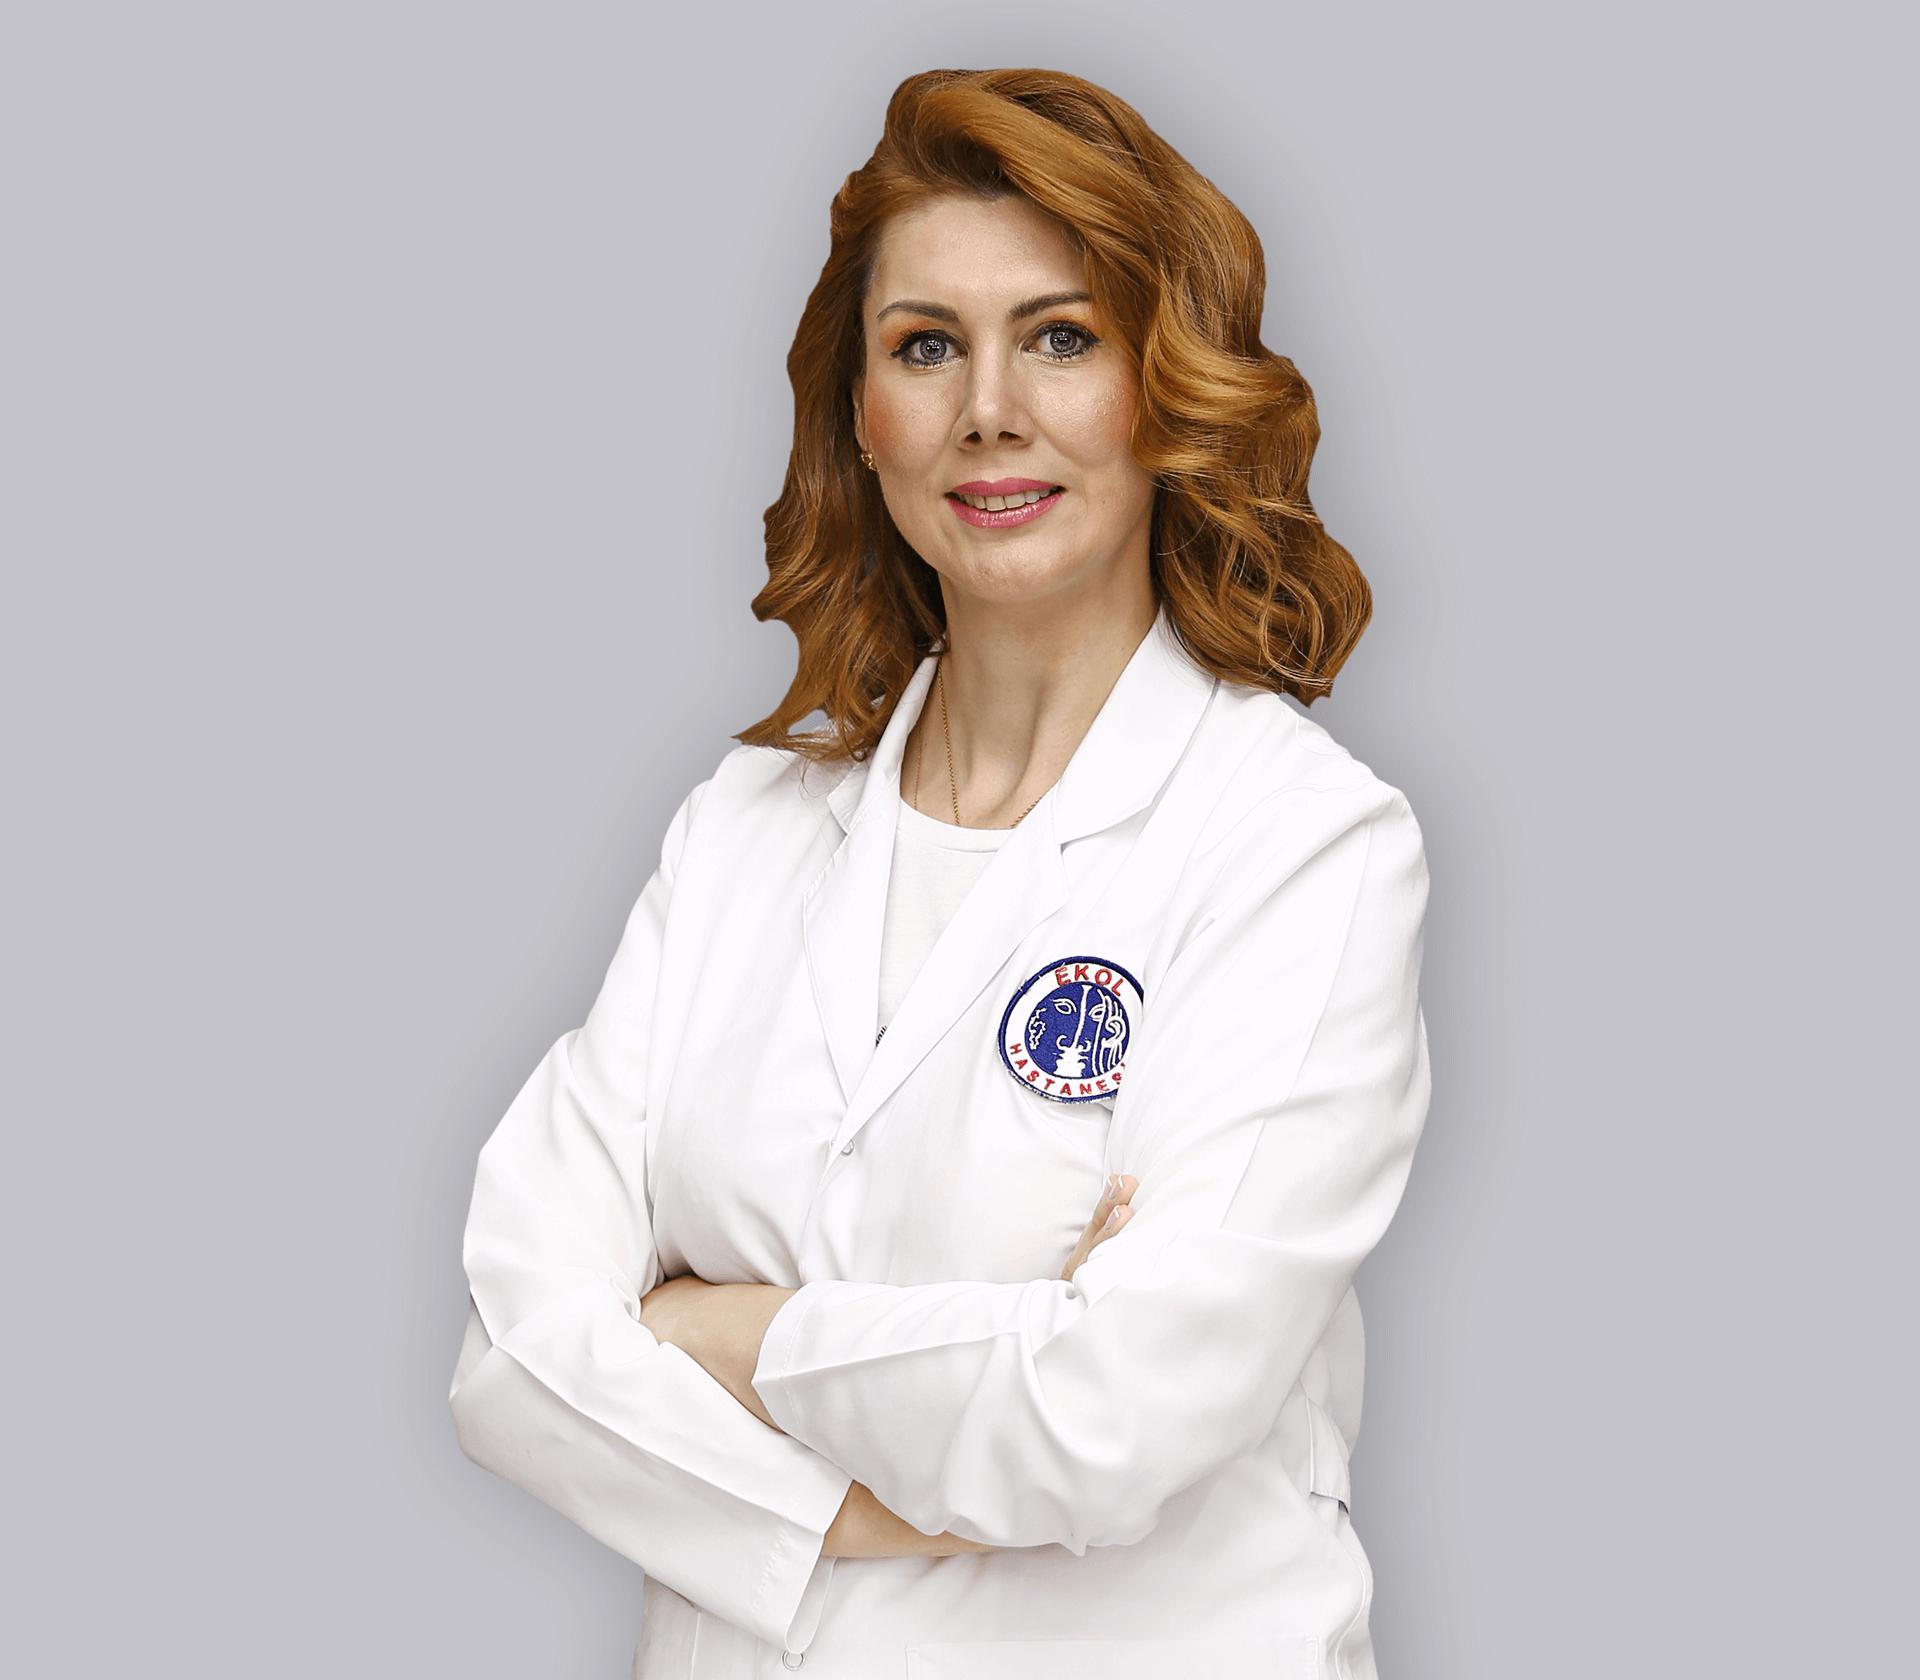 Uzm. Dr. Şenay Çitim